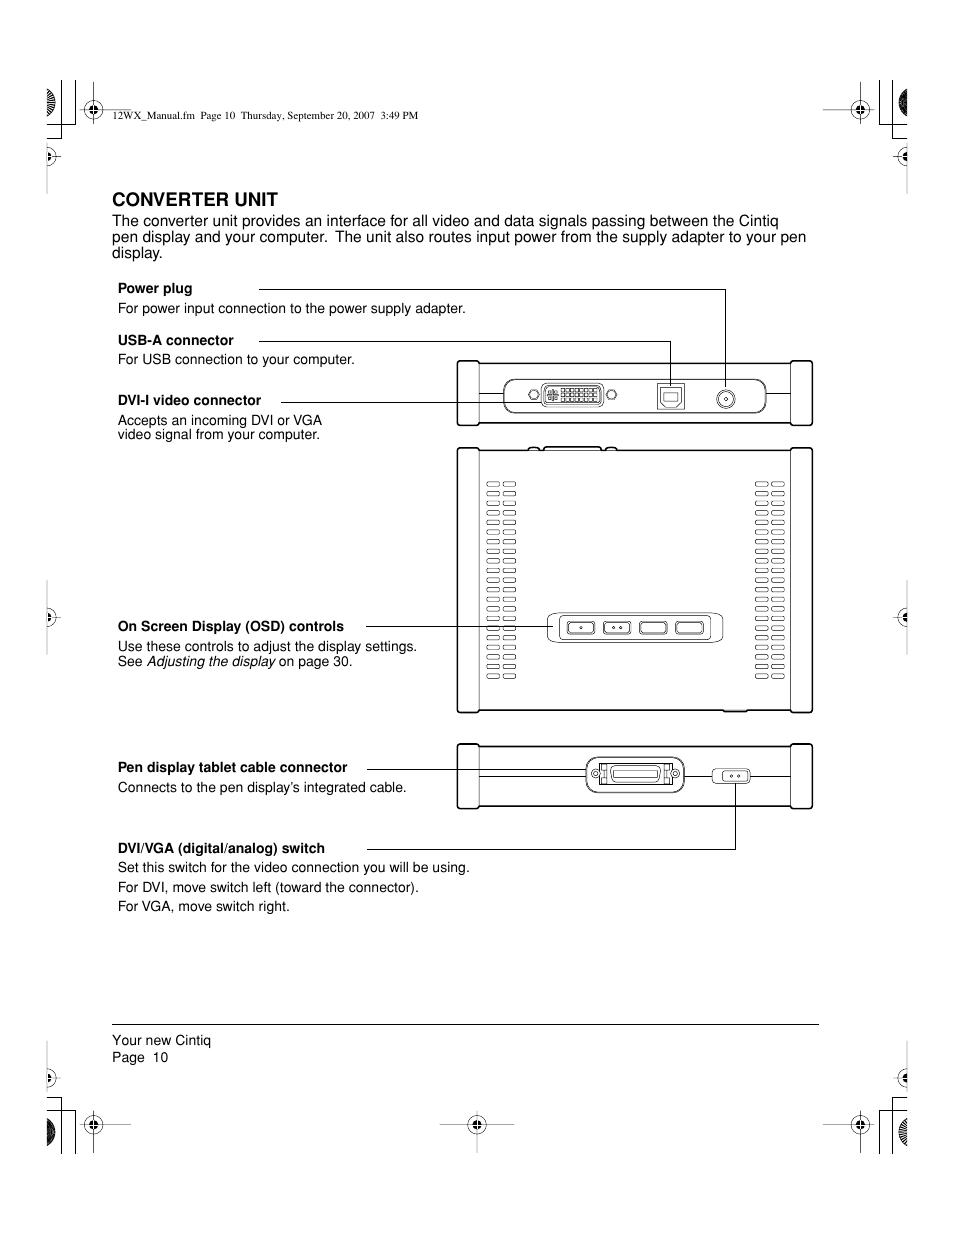 Converter unit | Wacom Cintiq DTZ-1200W User Manual | Page